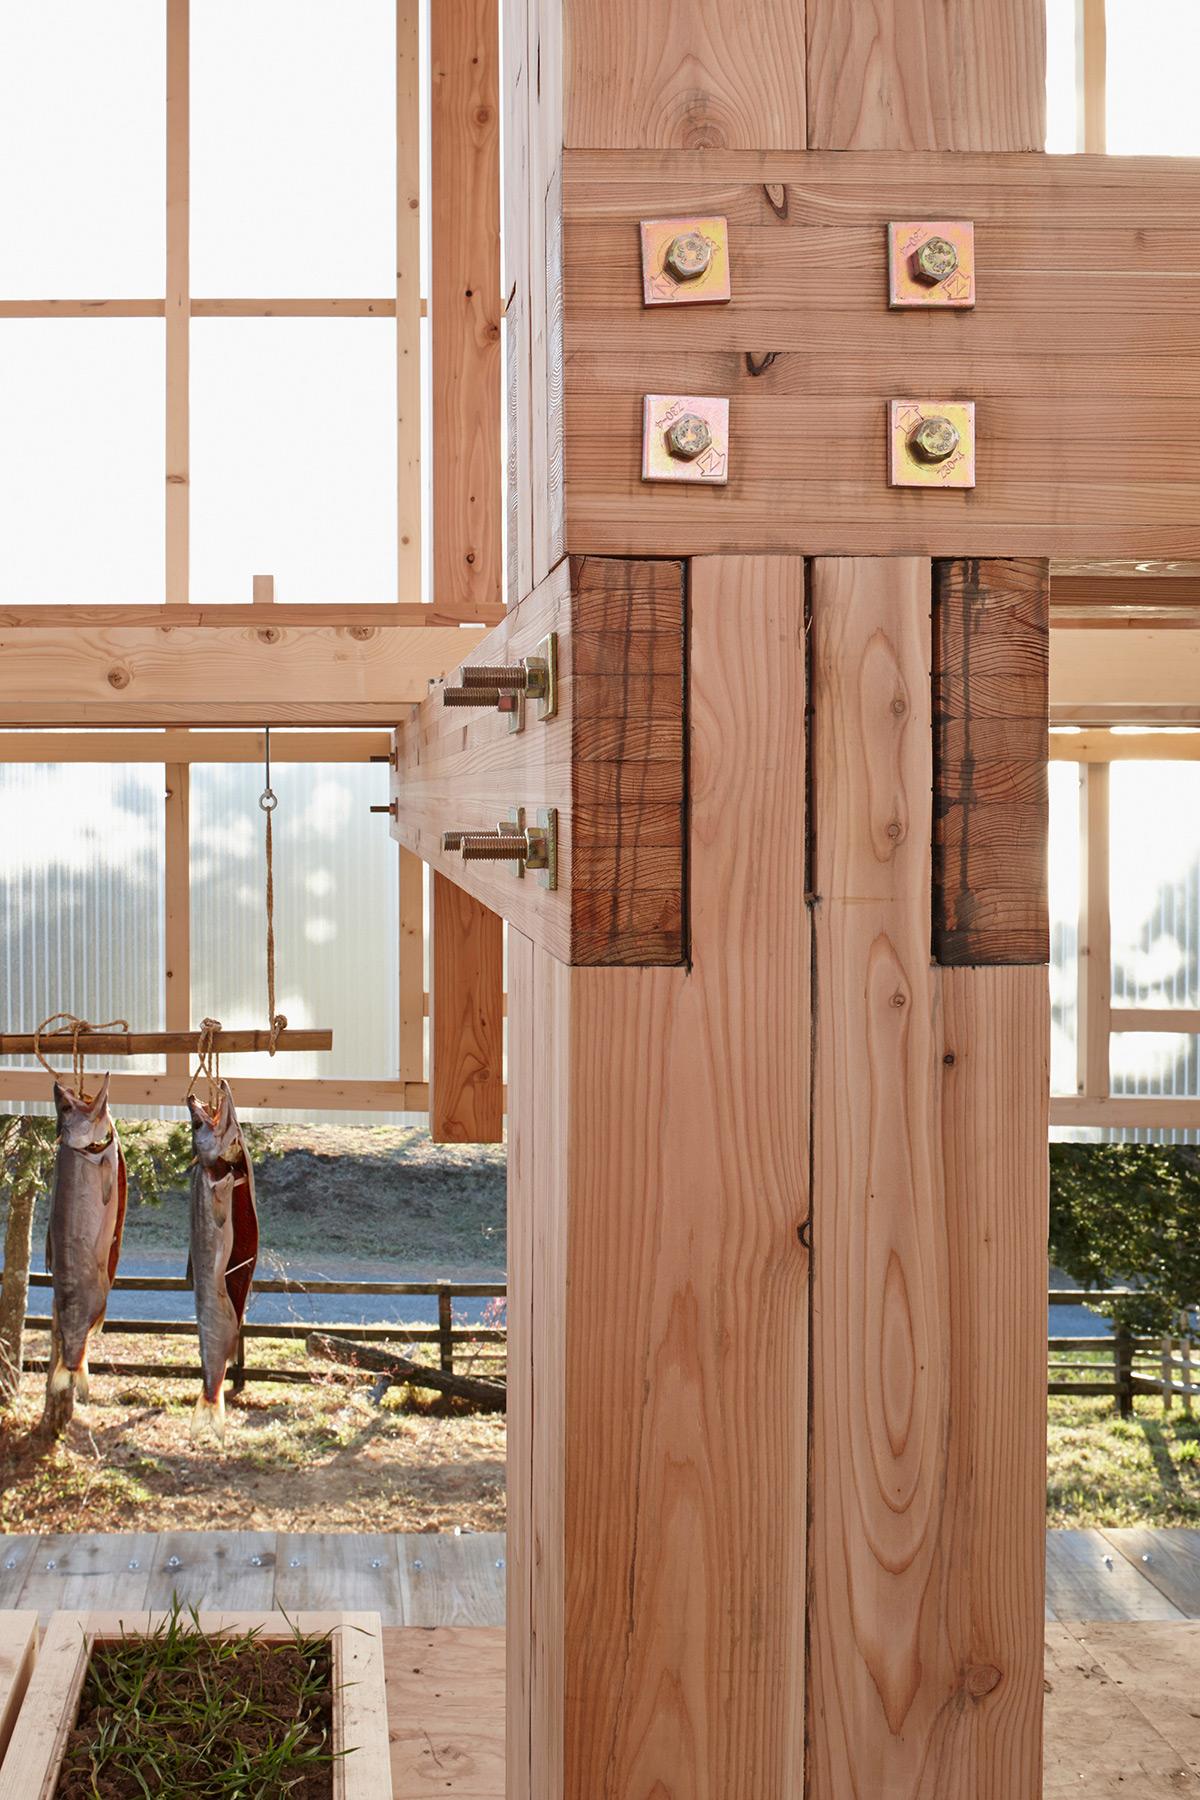 Nest We Grow / College of Environmental Design & Kengo Kuma & Associates (36)